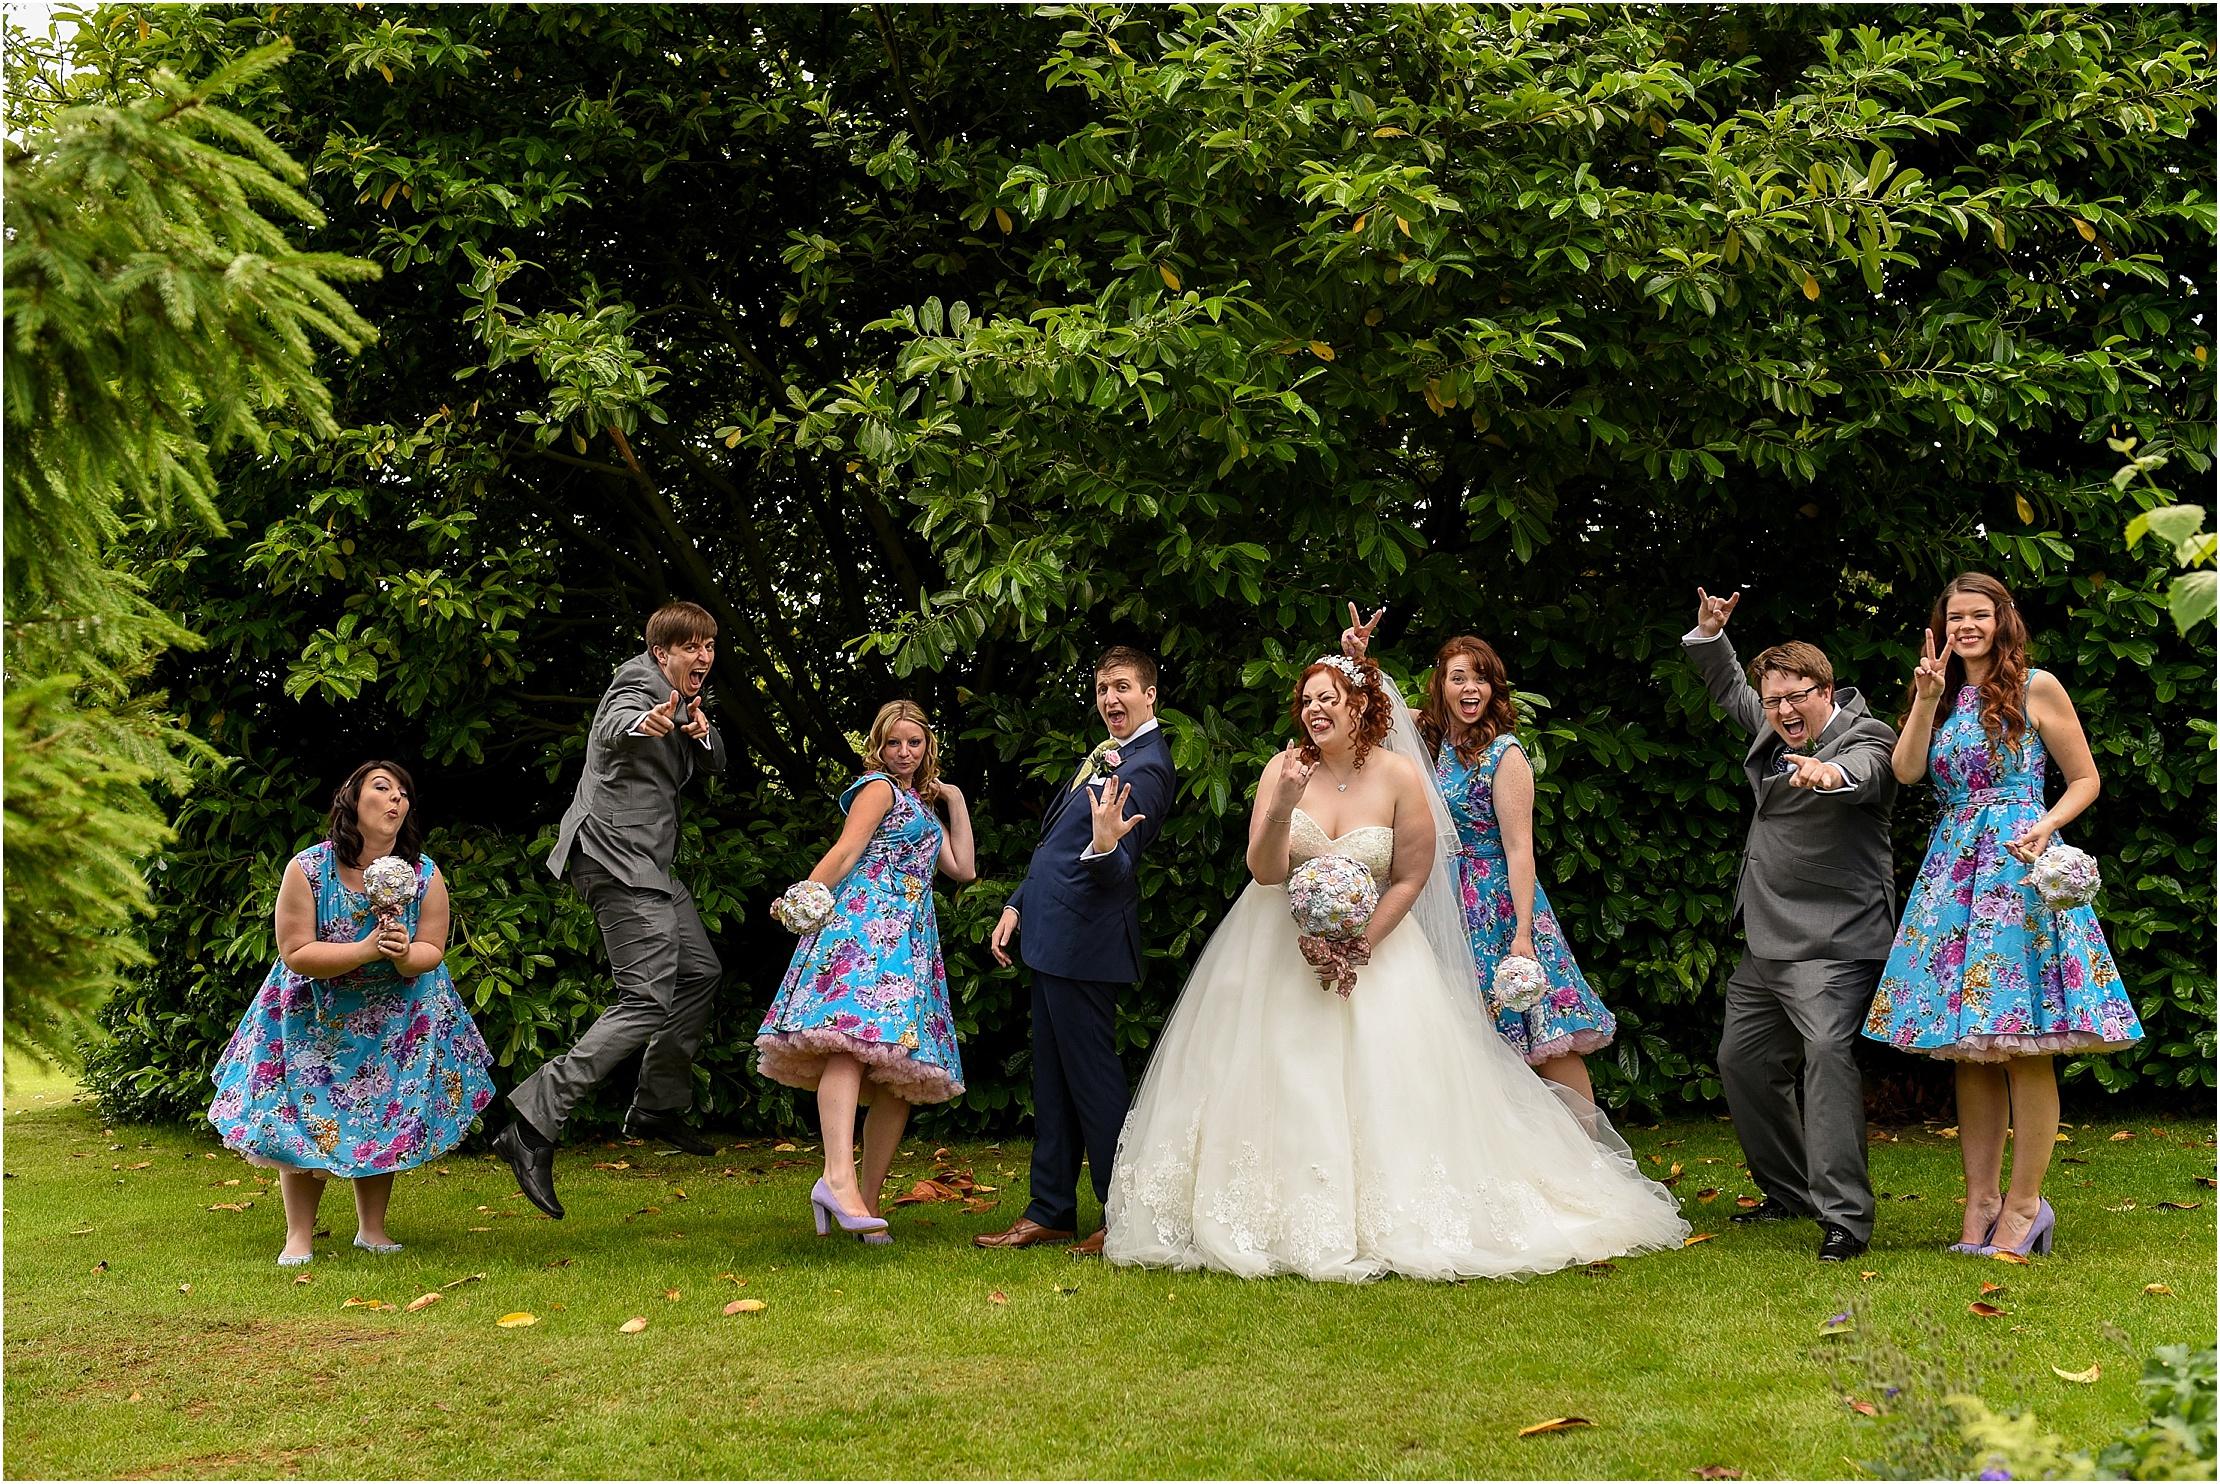 shireburn-arms-wedding- 086.jpg